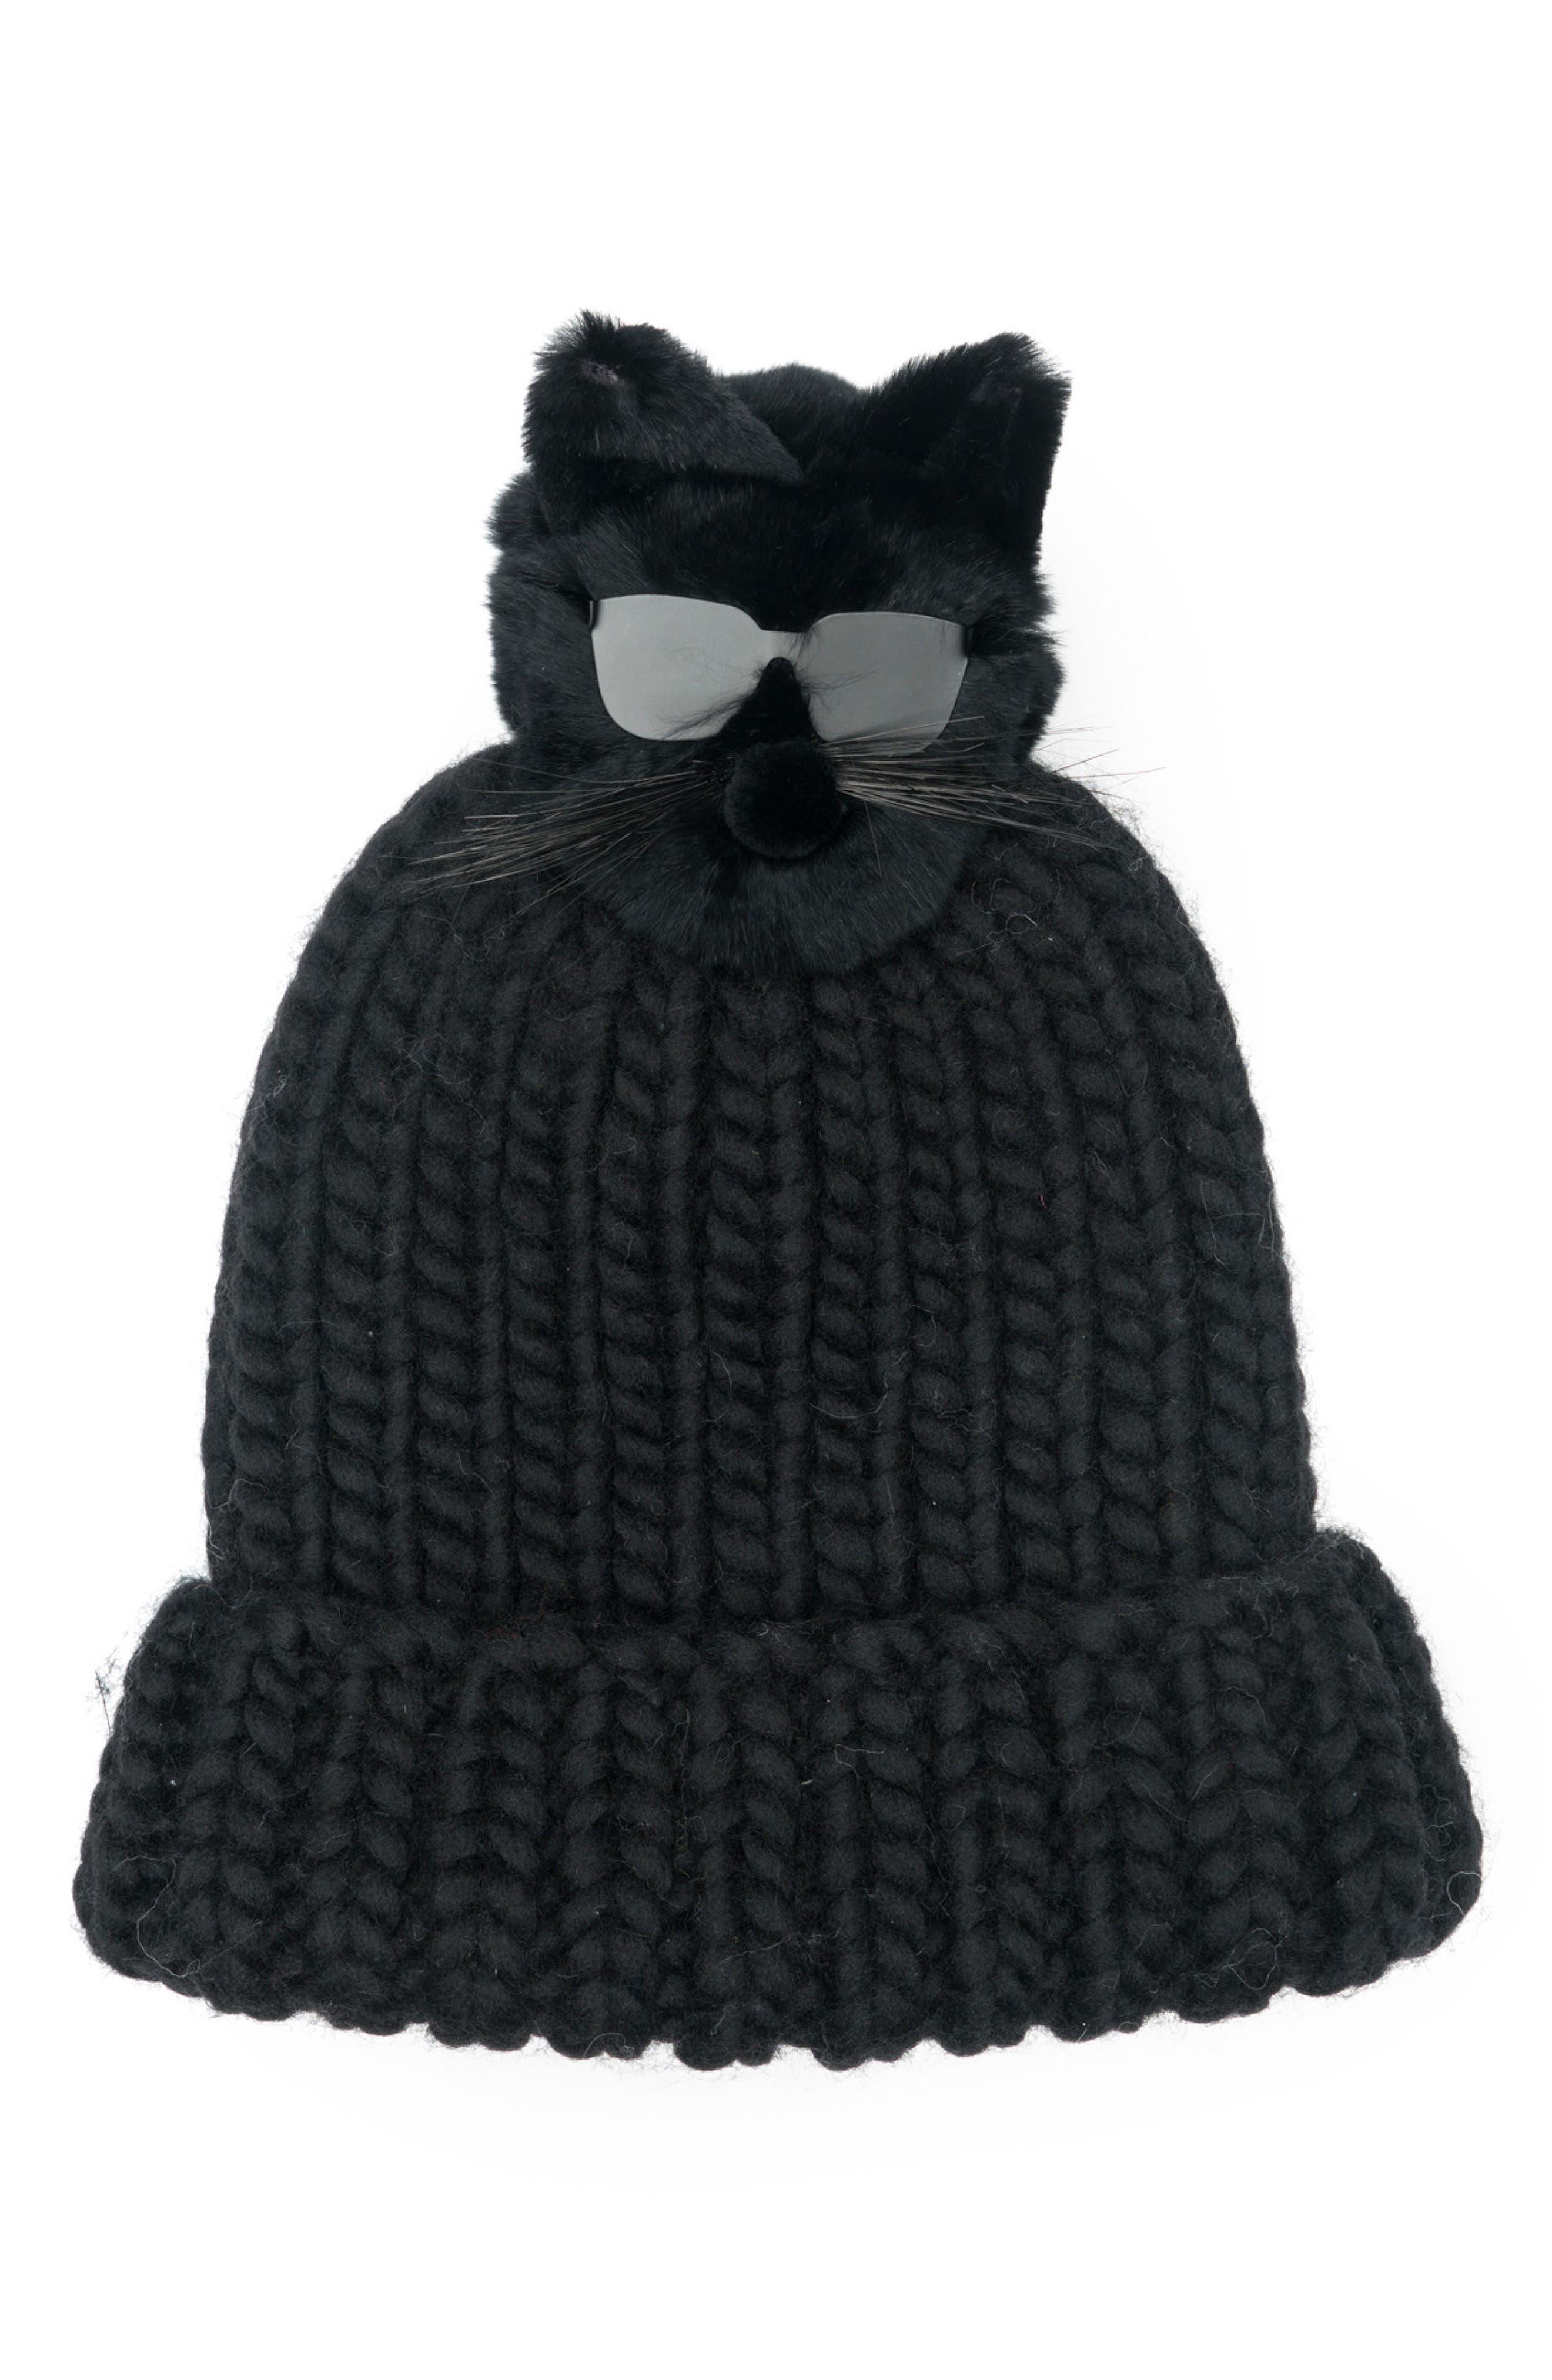 Rain Wool Stocking Cap with Genuine Fox Fur Pom,                             Main thumbnail 1, color,                             Black